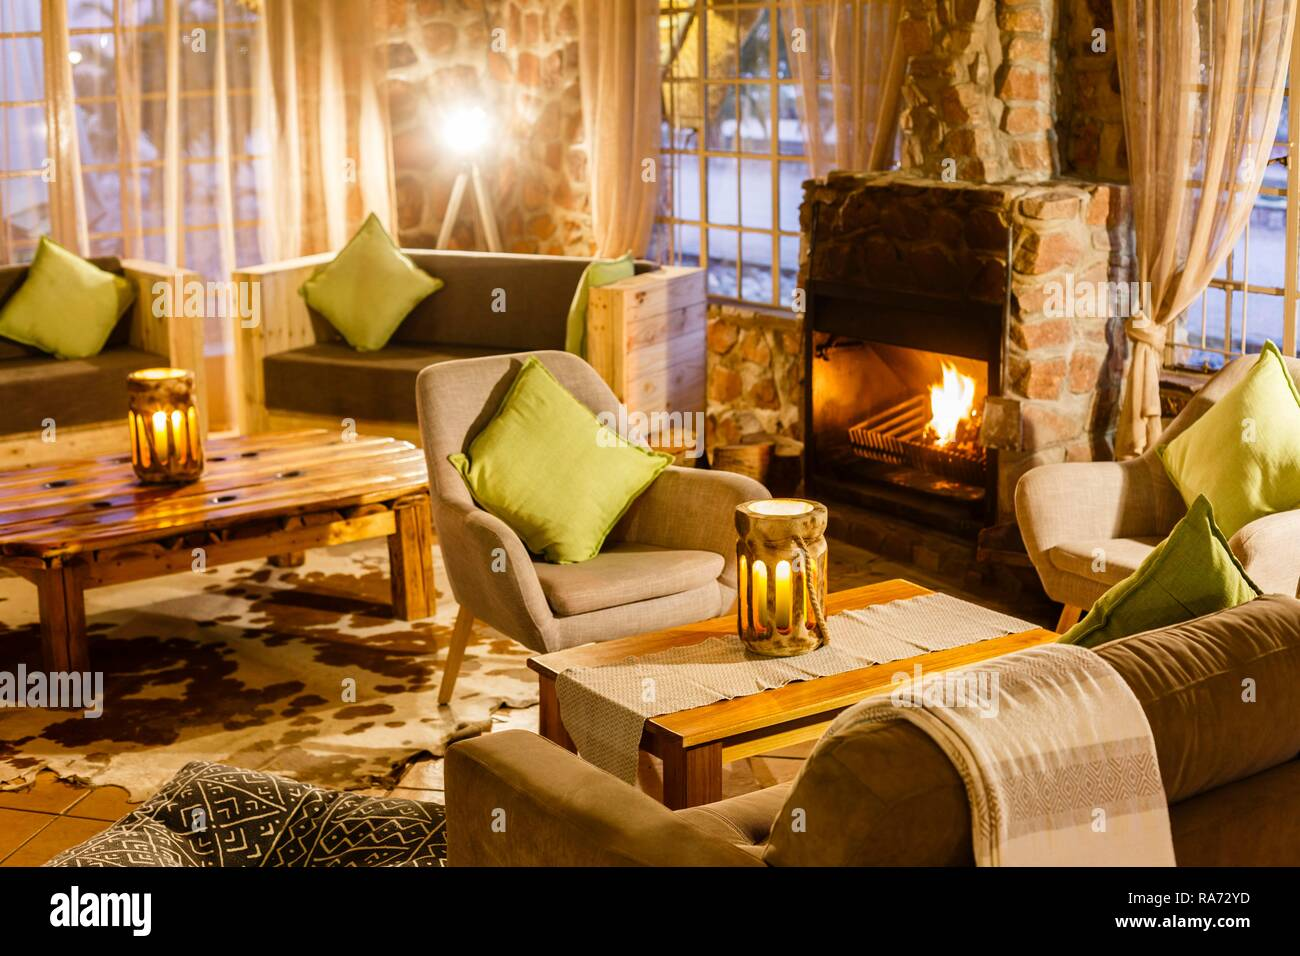 Cosy sitting area with fireplace, Elegant Desert Lodge, Sesriem, Namibia - Stock Image